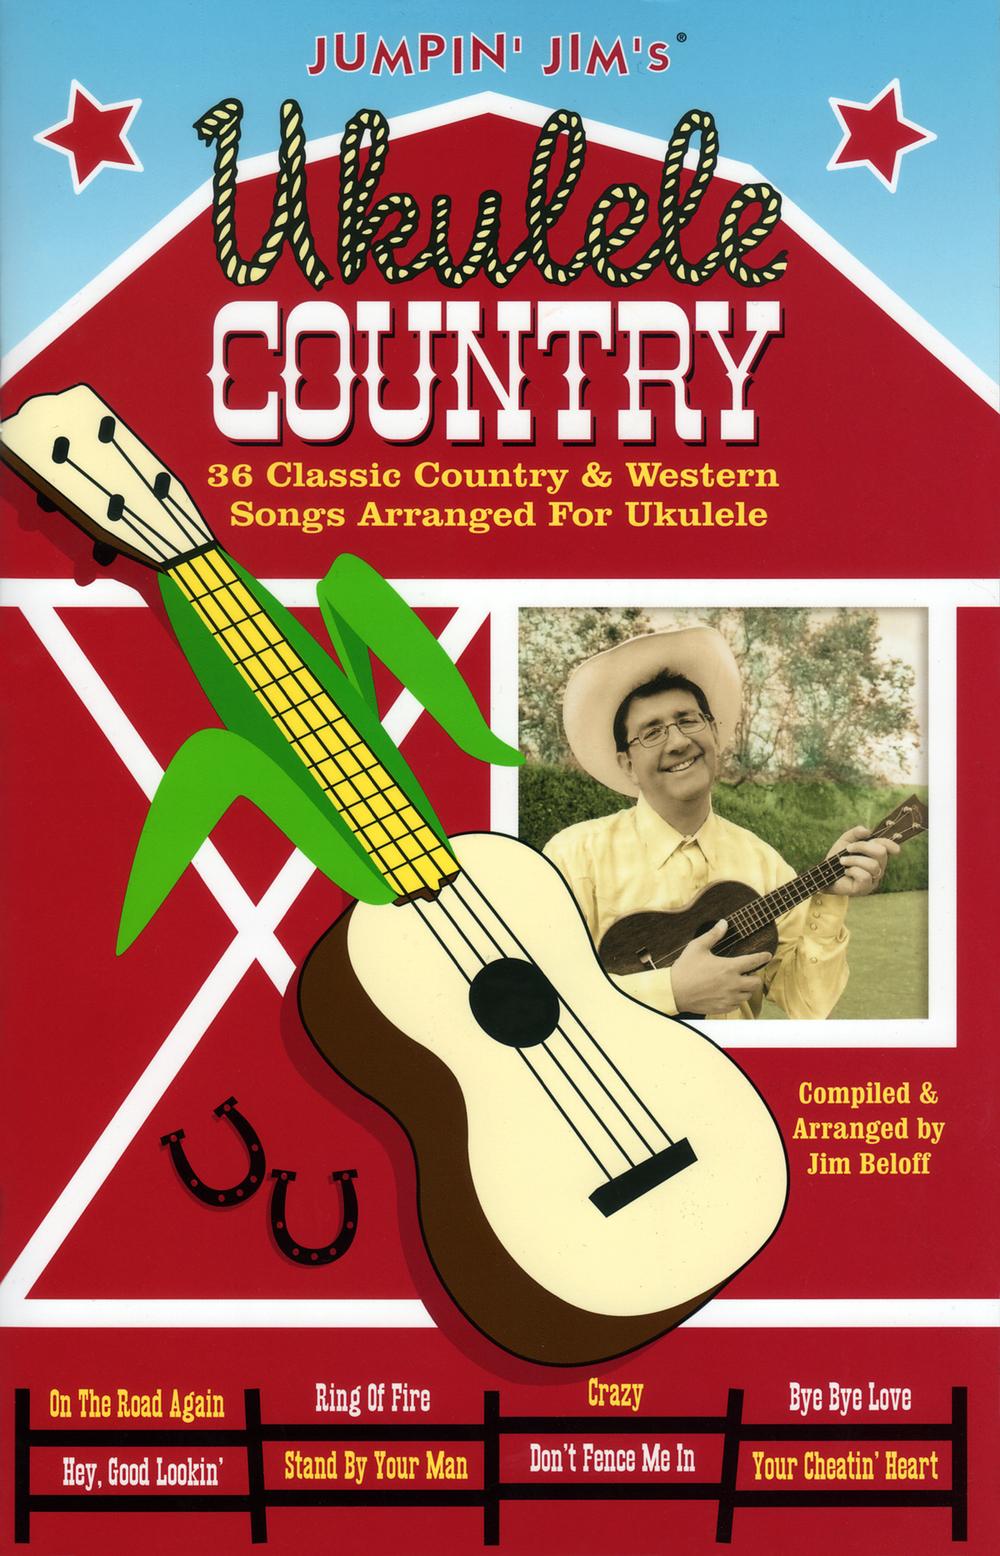 Jumpin' Jim's Ukulele Country